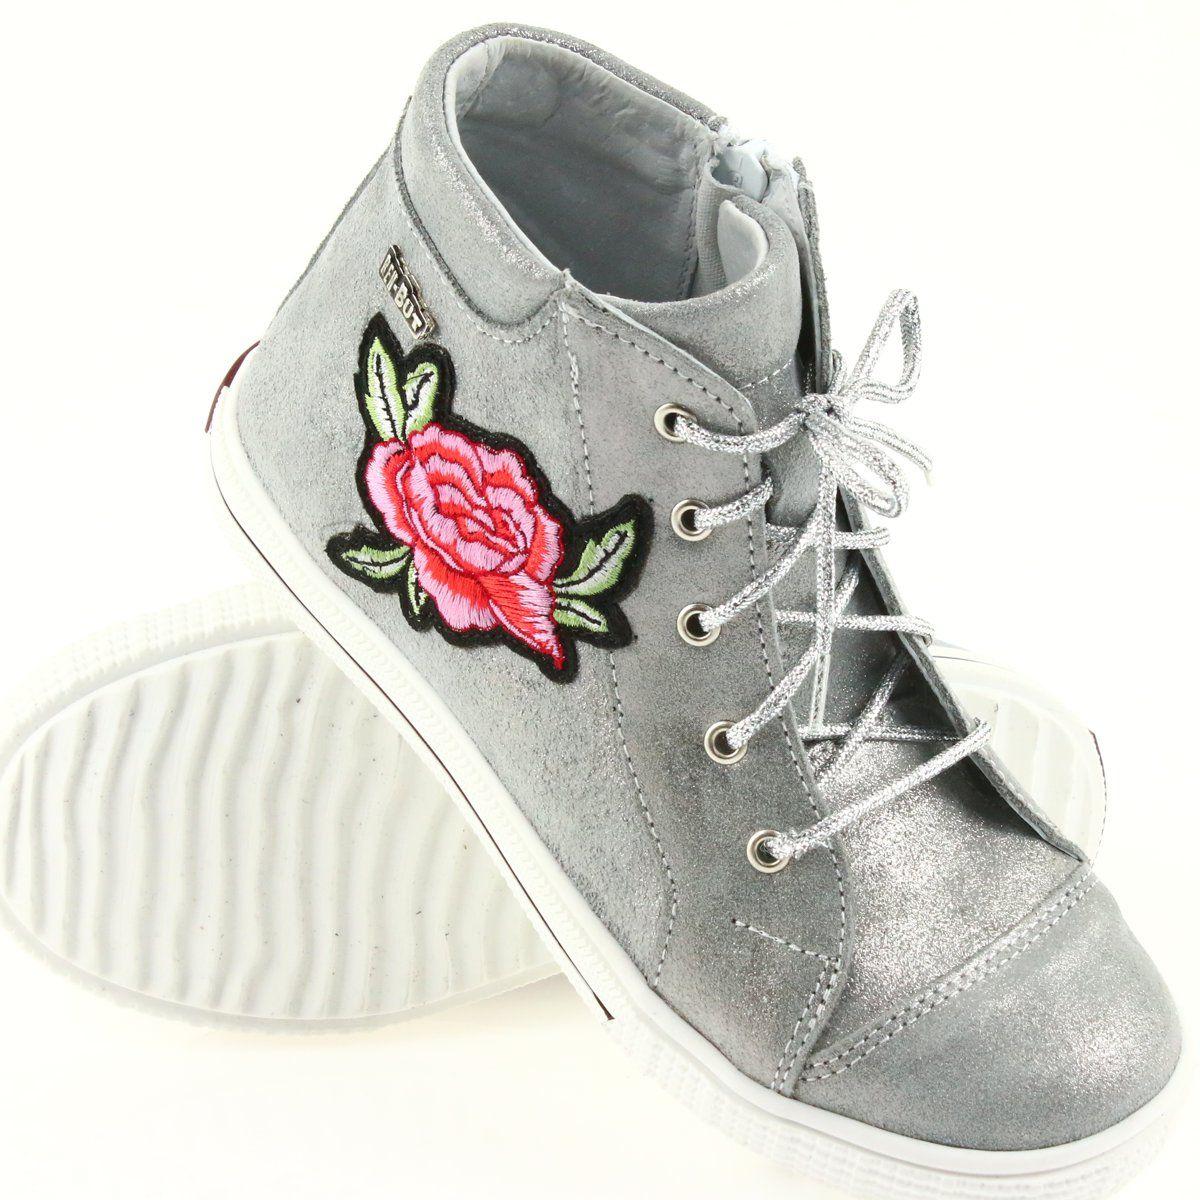 Trzewiki Buty Dziewczece Srebrne Ren But 4279 Srebrny High Top Sneakers Converse High Top Sneaker Chucks Converse